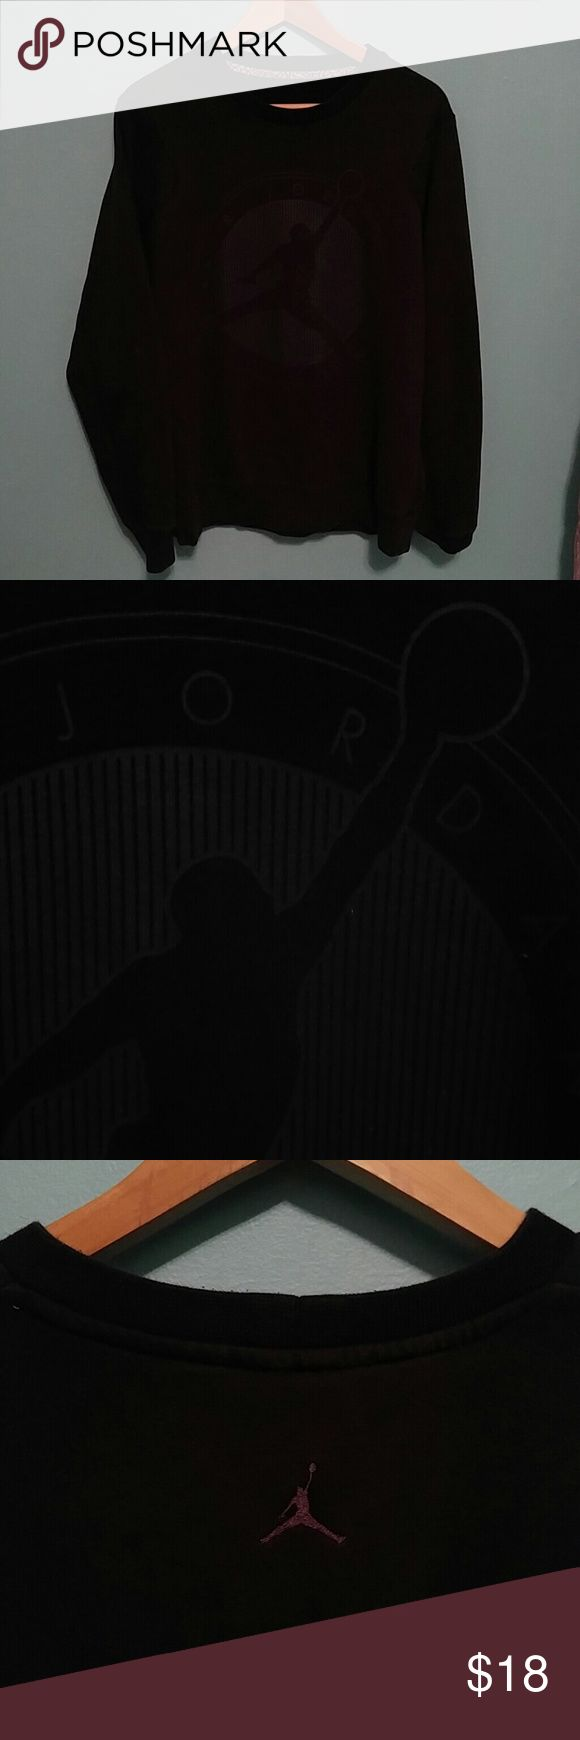 "Air Jordan Flight Club crewmen sweatshirt L Black Jordan crewneck sweatshirt featuring dark grey Jordan Flight Club logo on front and Jordan logo on back. Length 27"", Width 22.5"" Jordan Shirts Sweatshirts & Hoodies"